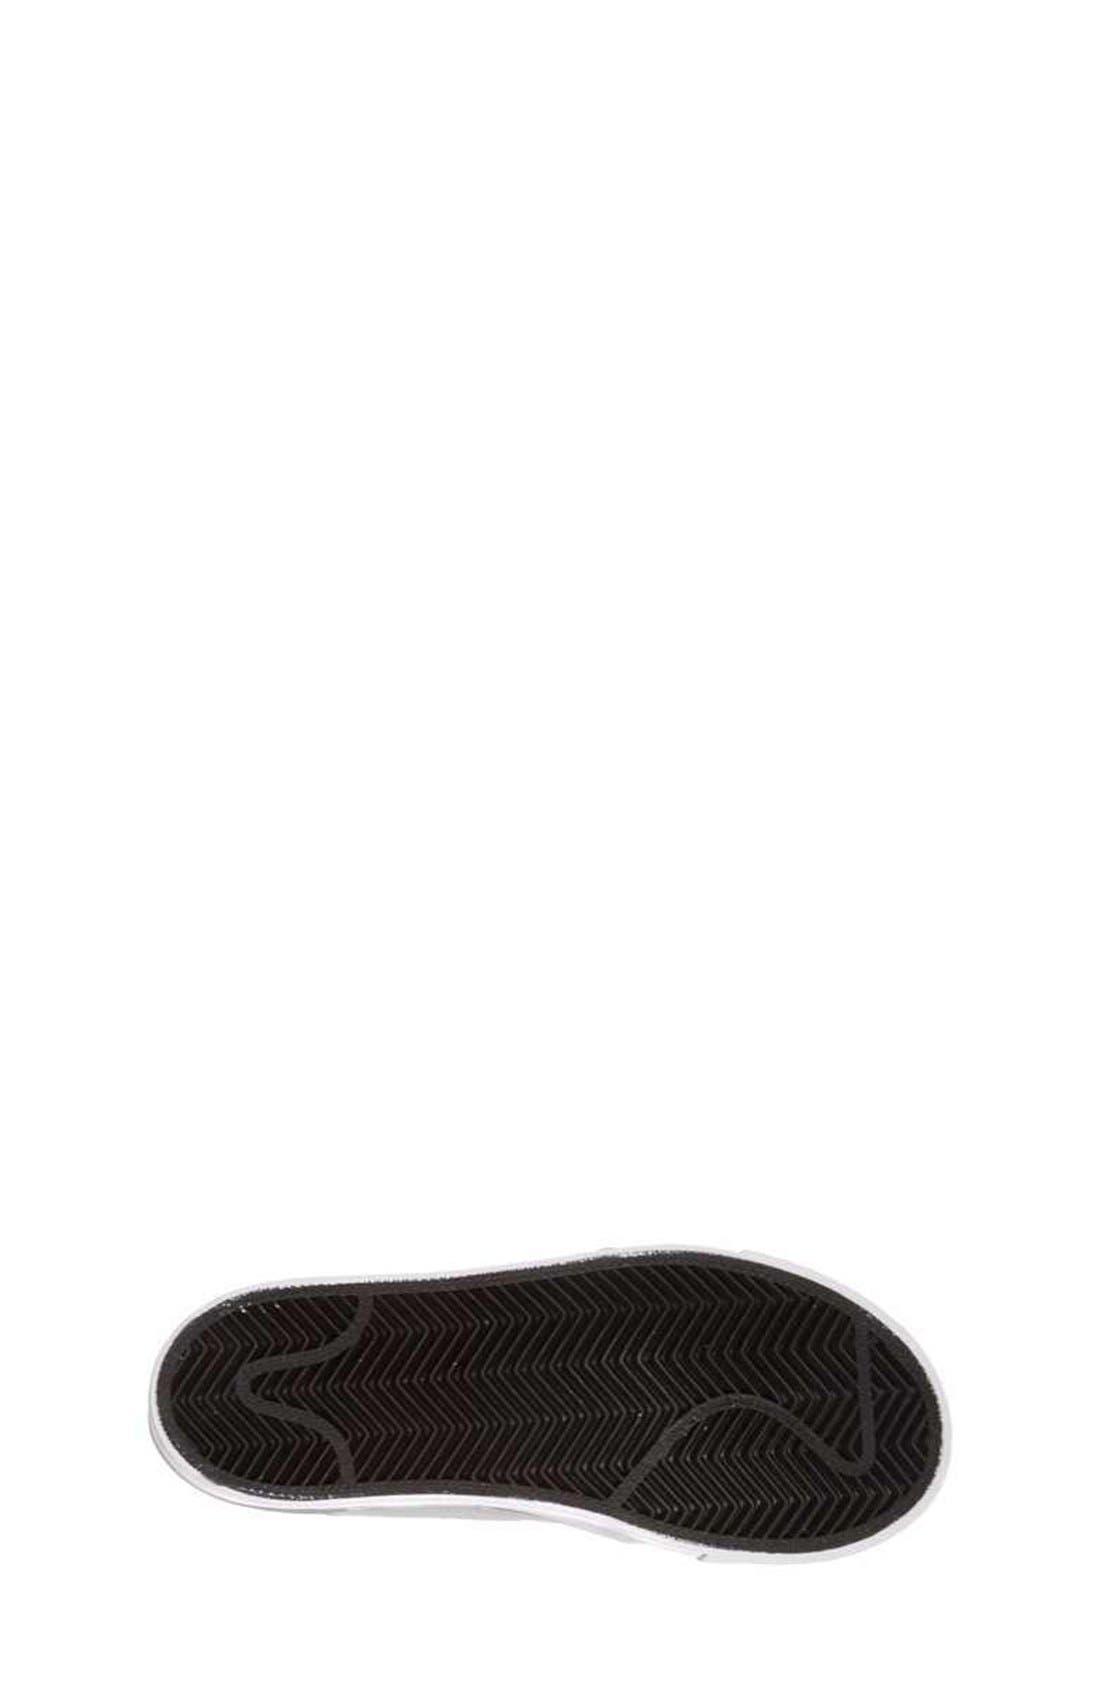 'Stefan Janoski' Sneaker,                             Alternate thumbnail 50, color,